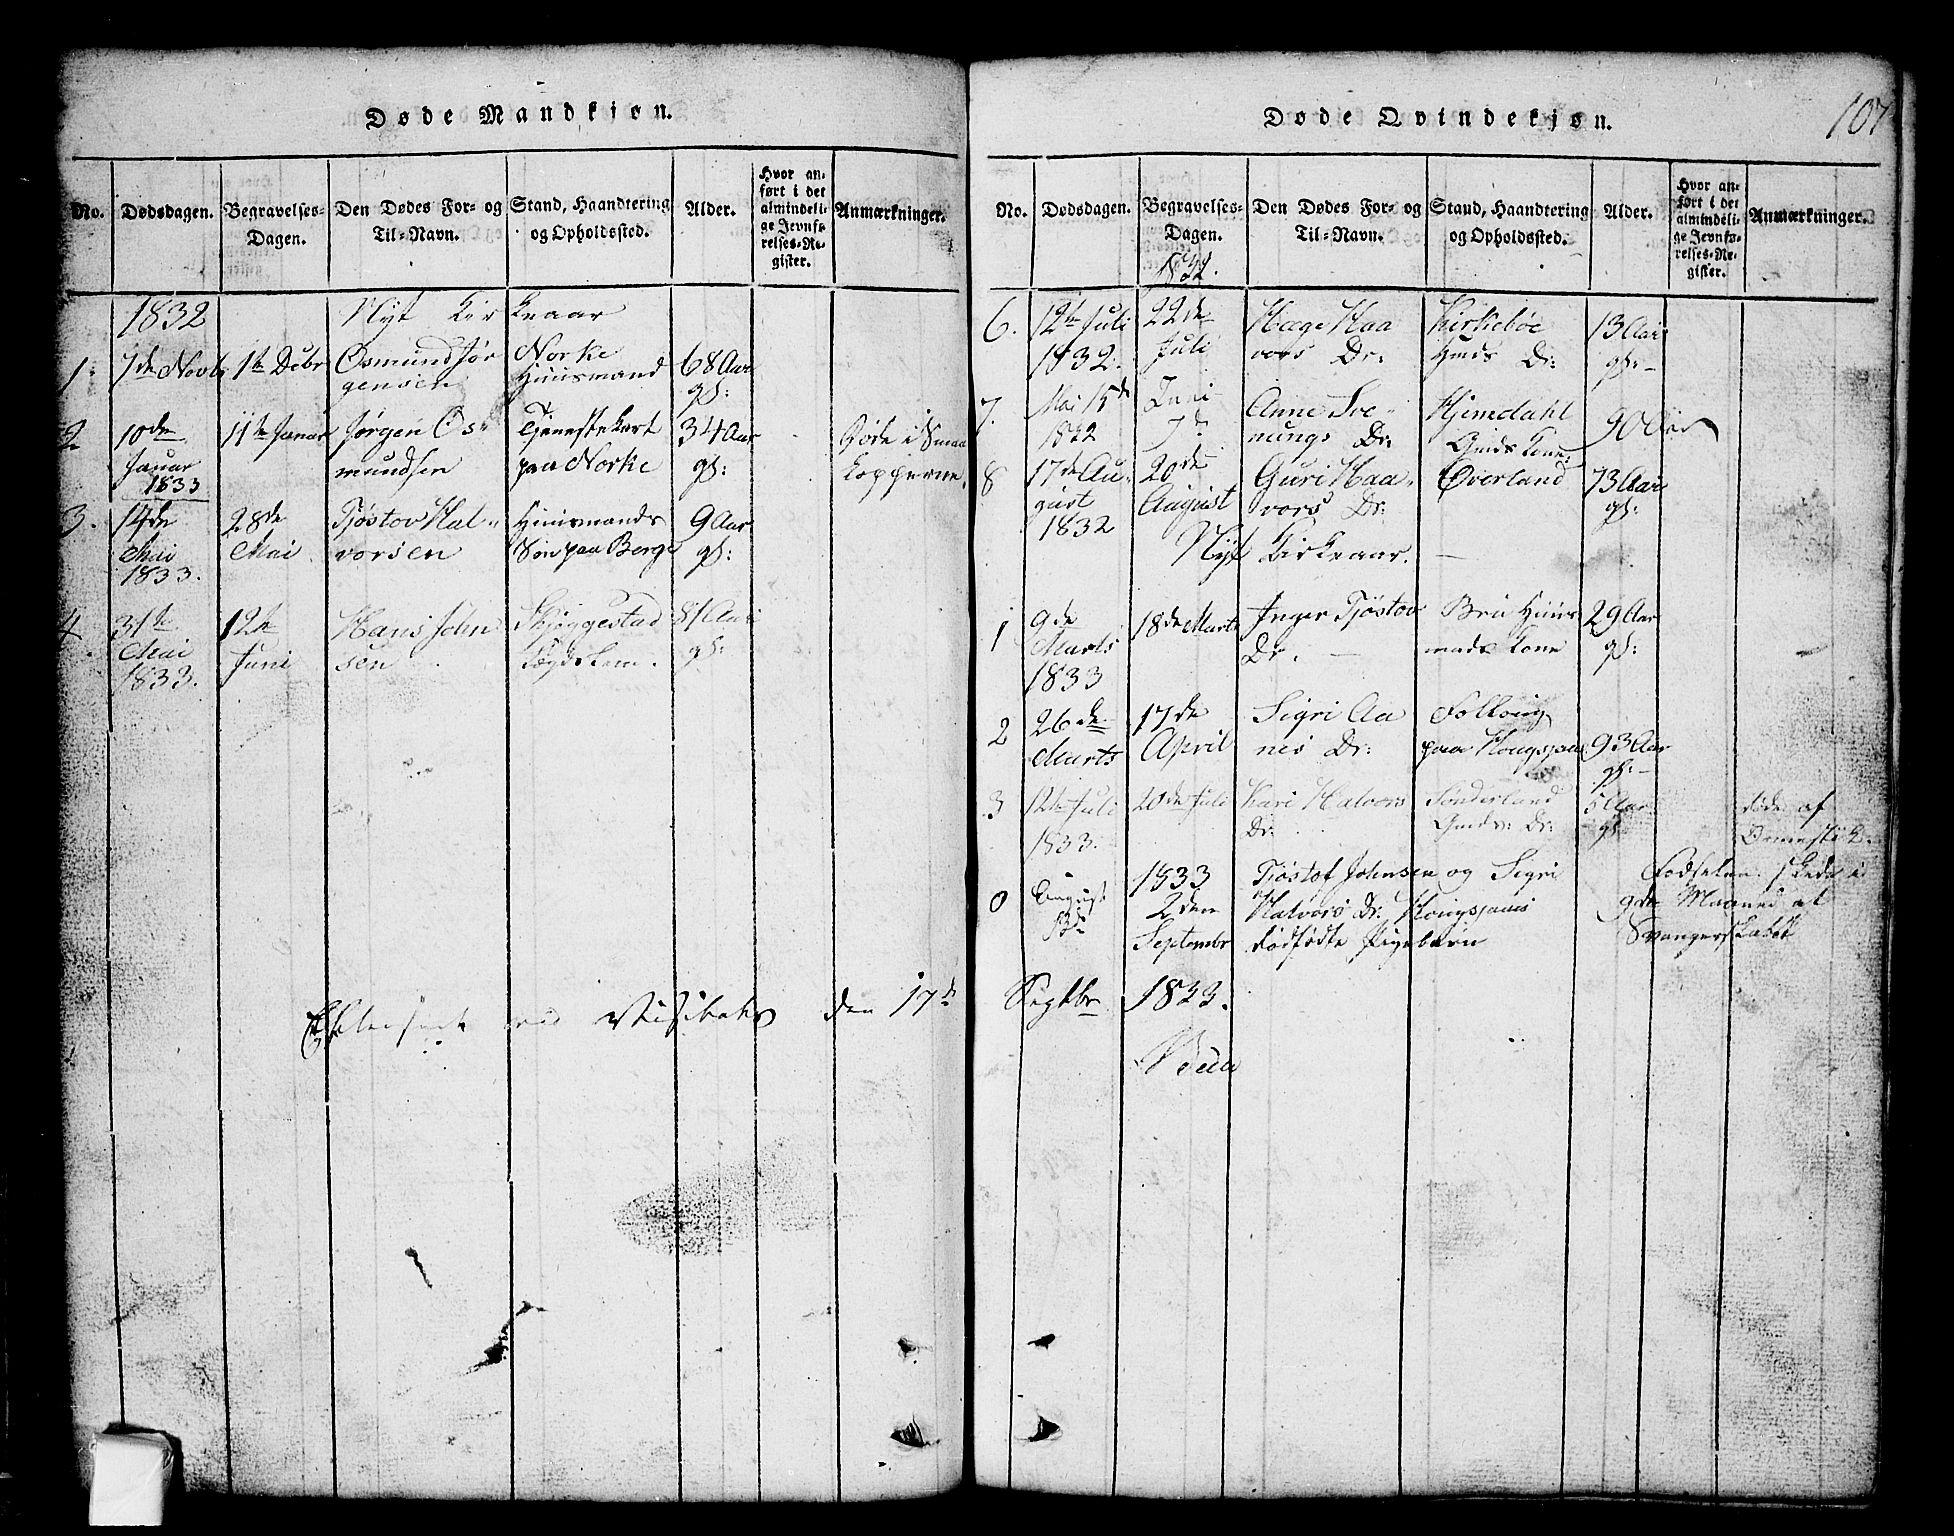 SAKO, Nissedal kirkebøker, G/Gb/L0001: Klokkerbok nr. II 1, 1814-1862, s. 107